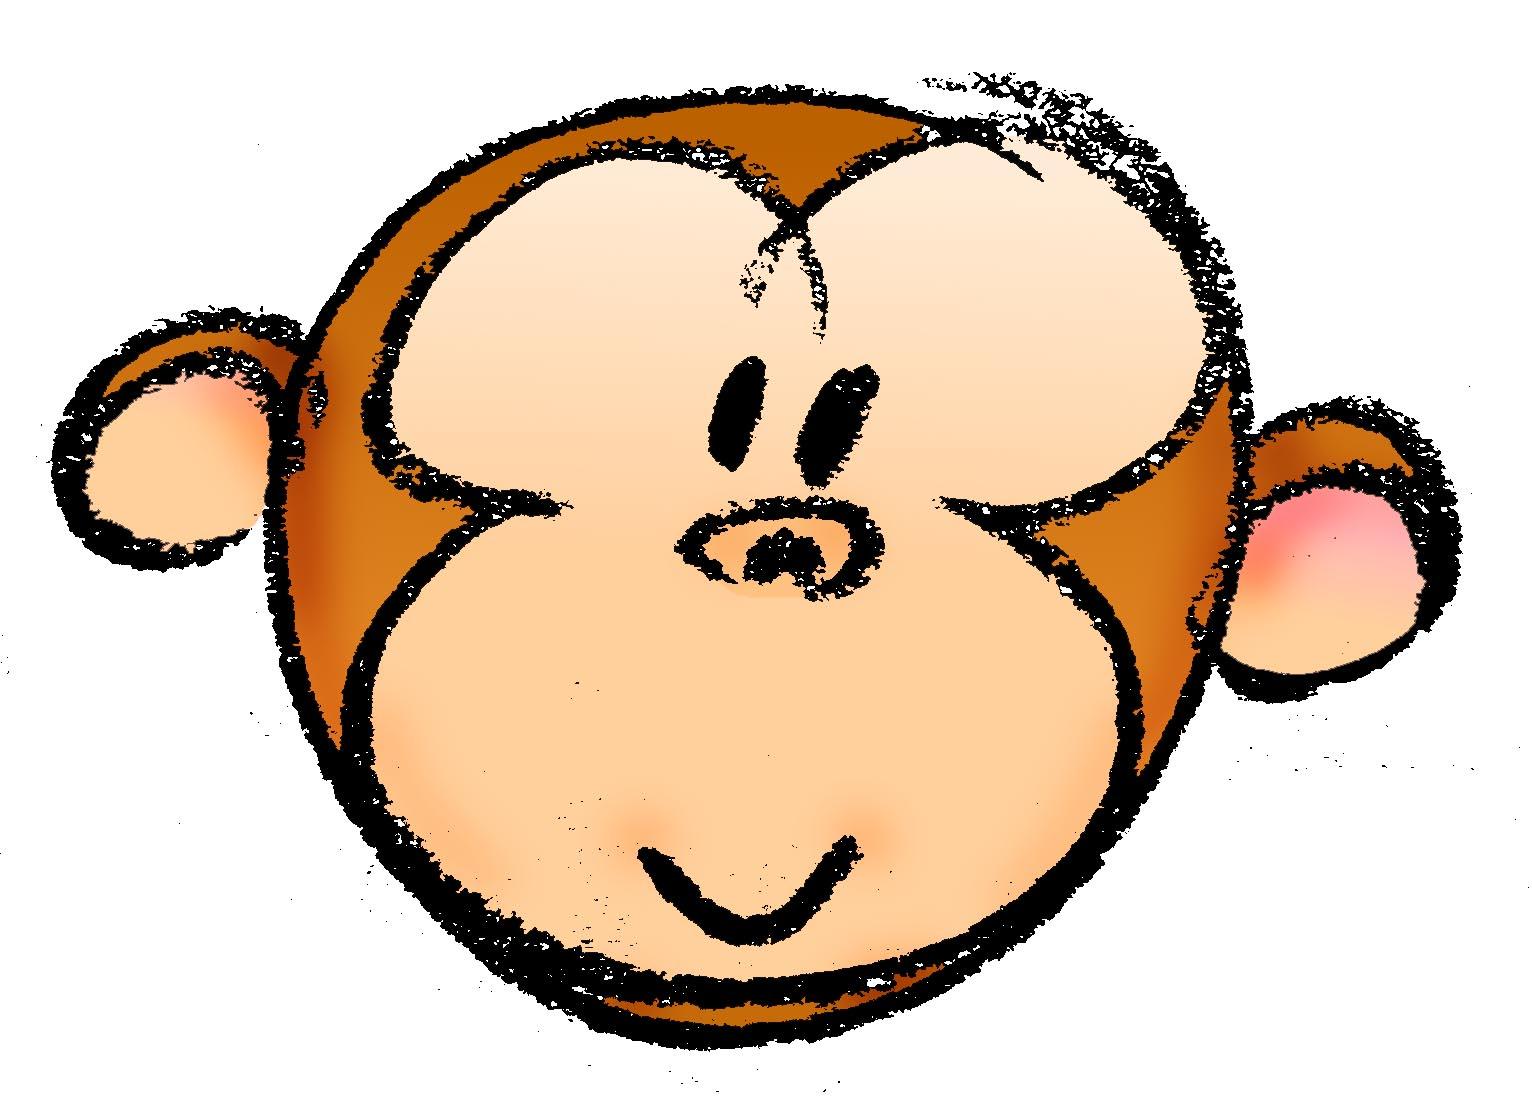 Monkey Face Cartoon - ClipArt Best